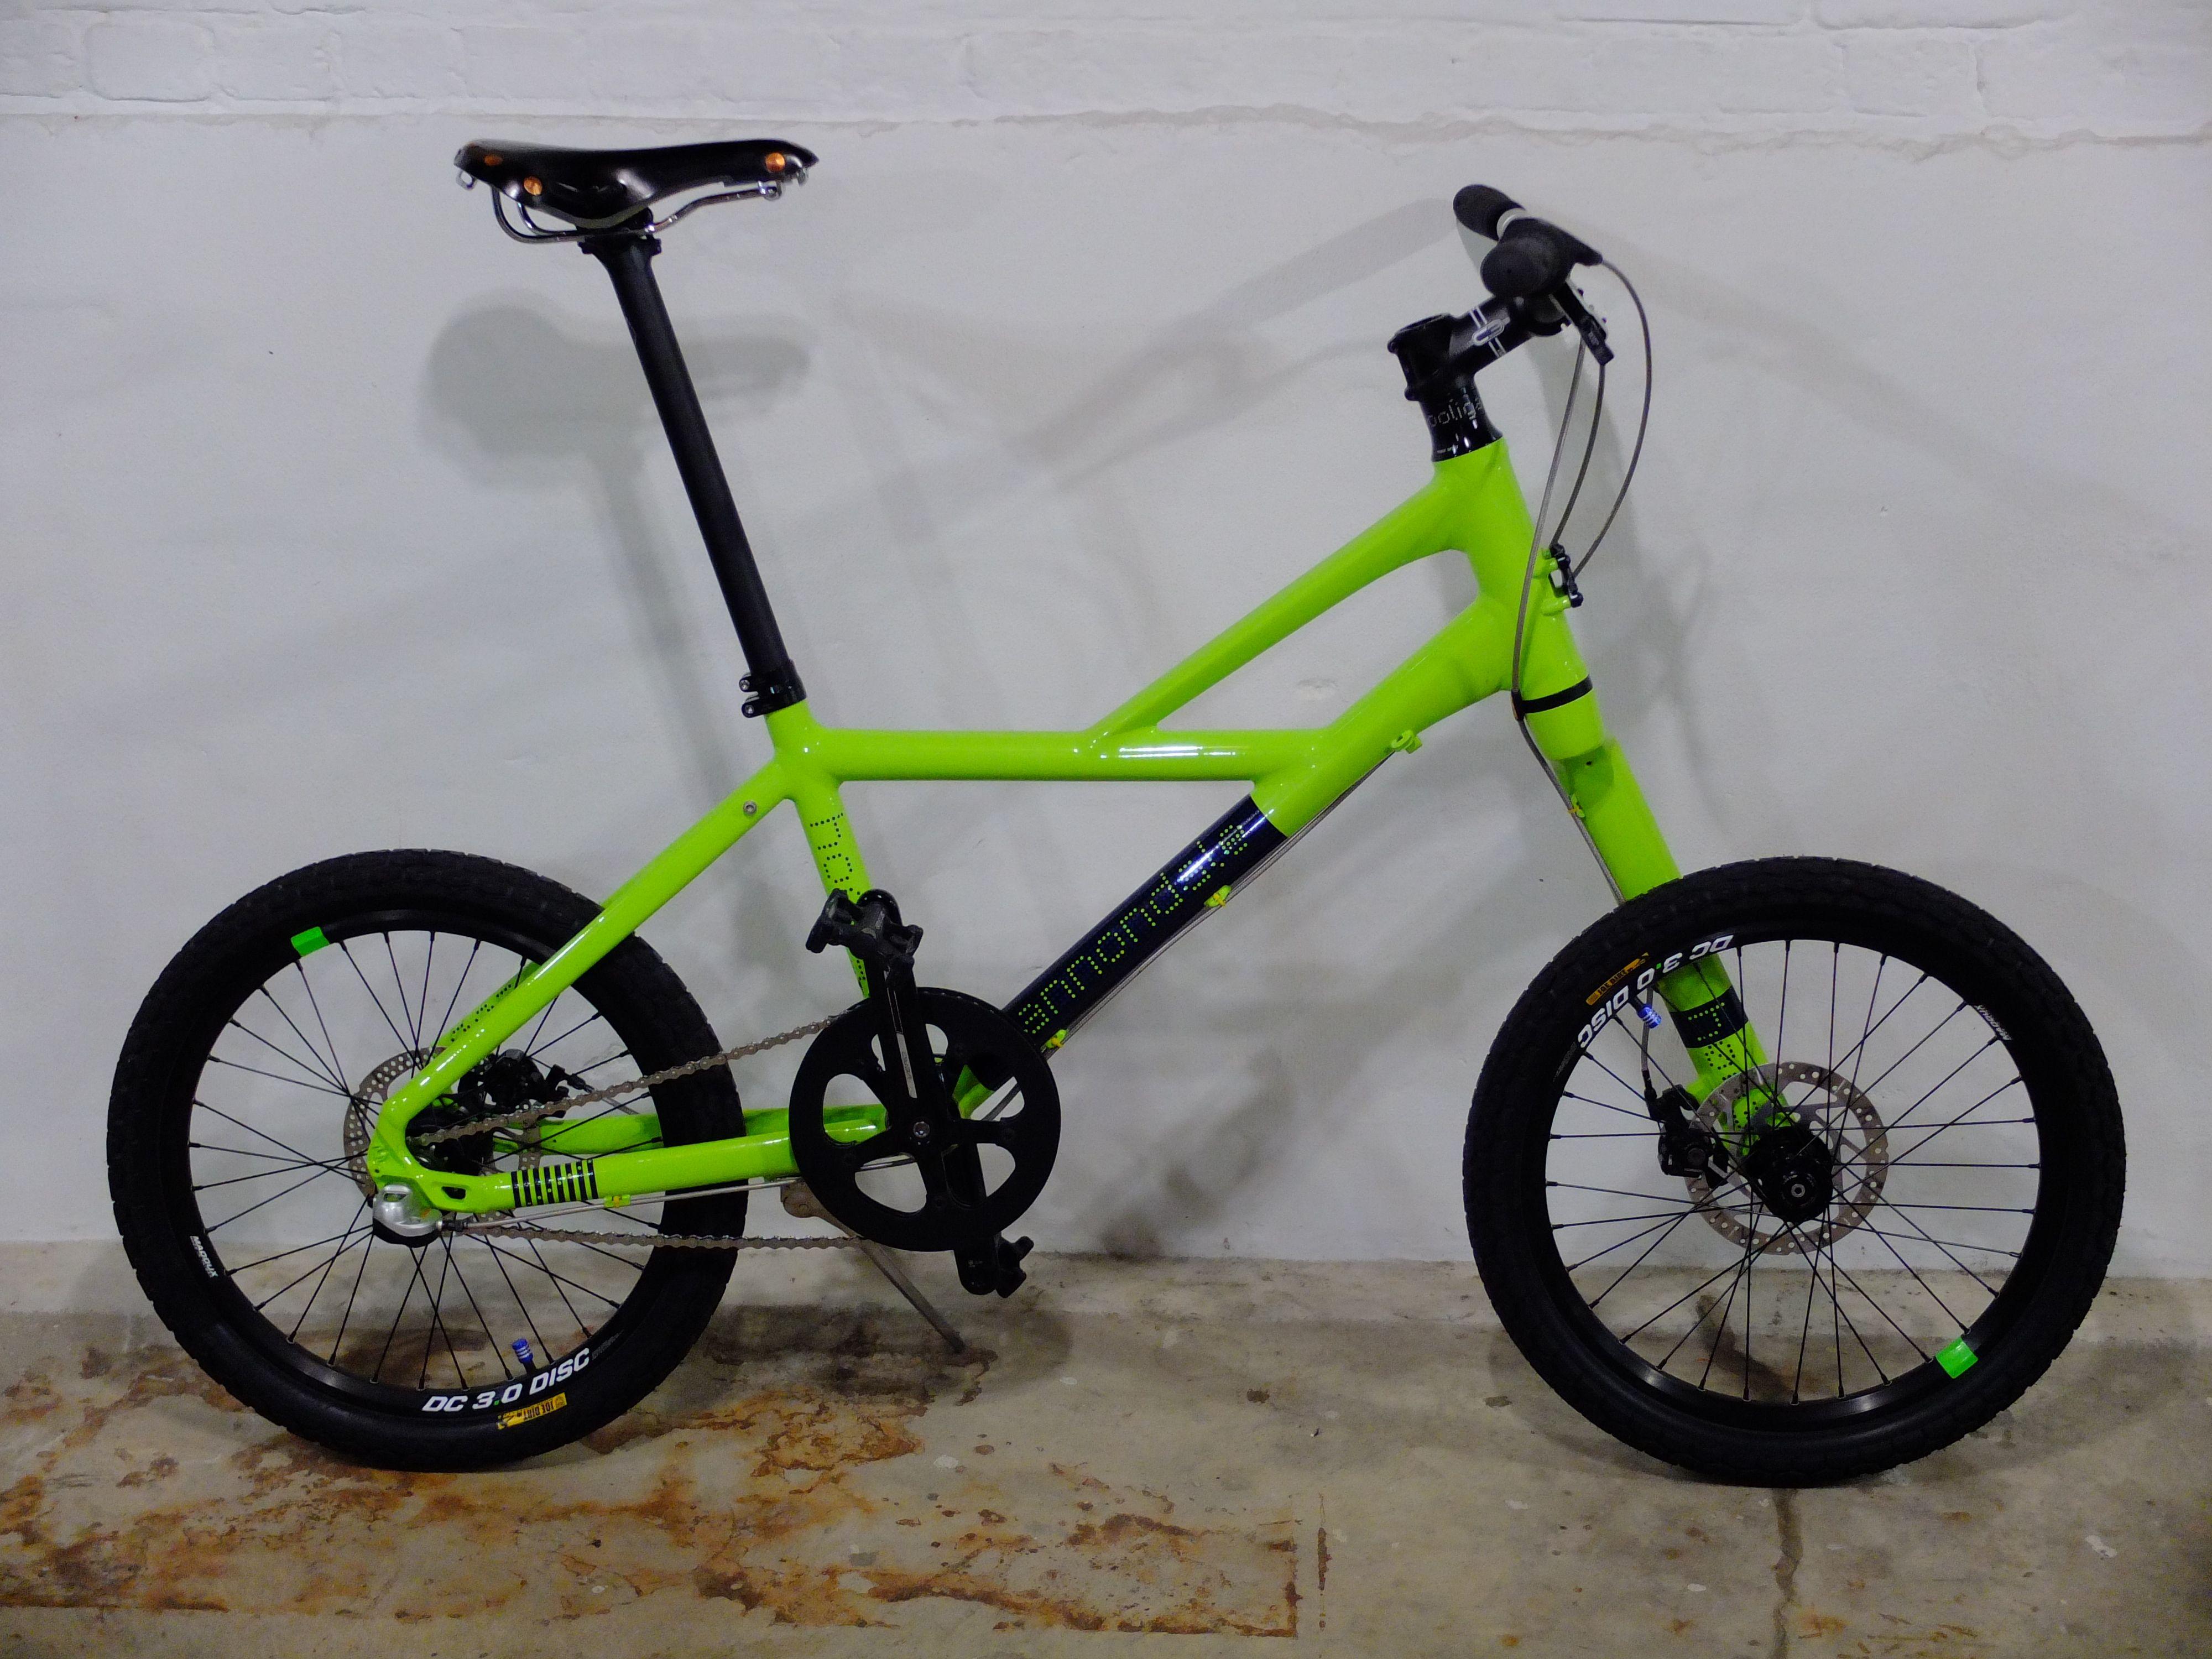 Mini Velo Bike Cannondale Hooligan Modified Bicycle